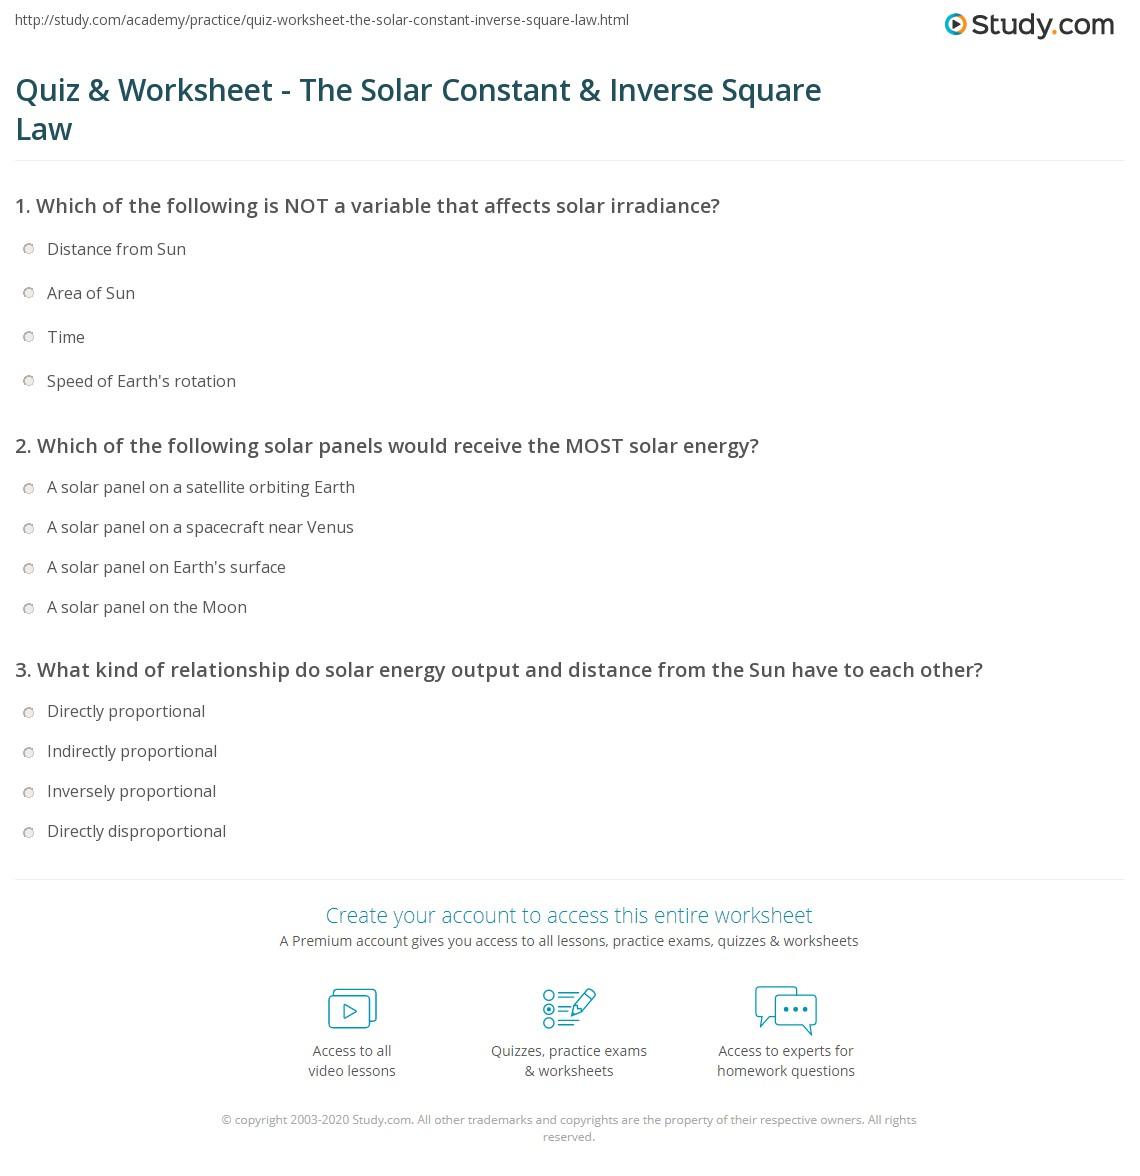 Quiz W Ksheet L R C St Nt Verse Squ Re L W Study